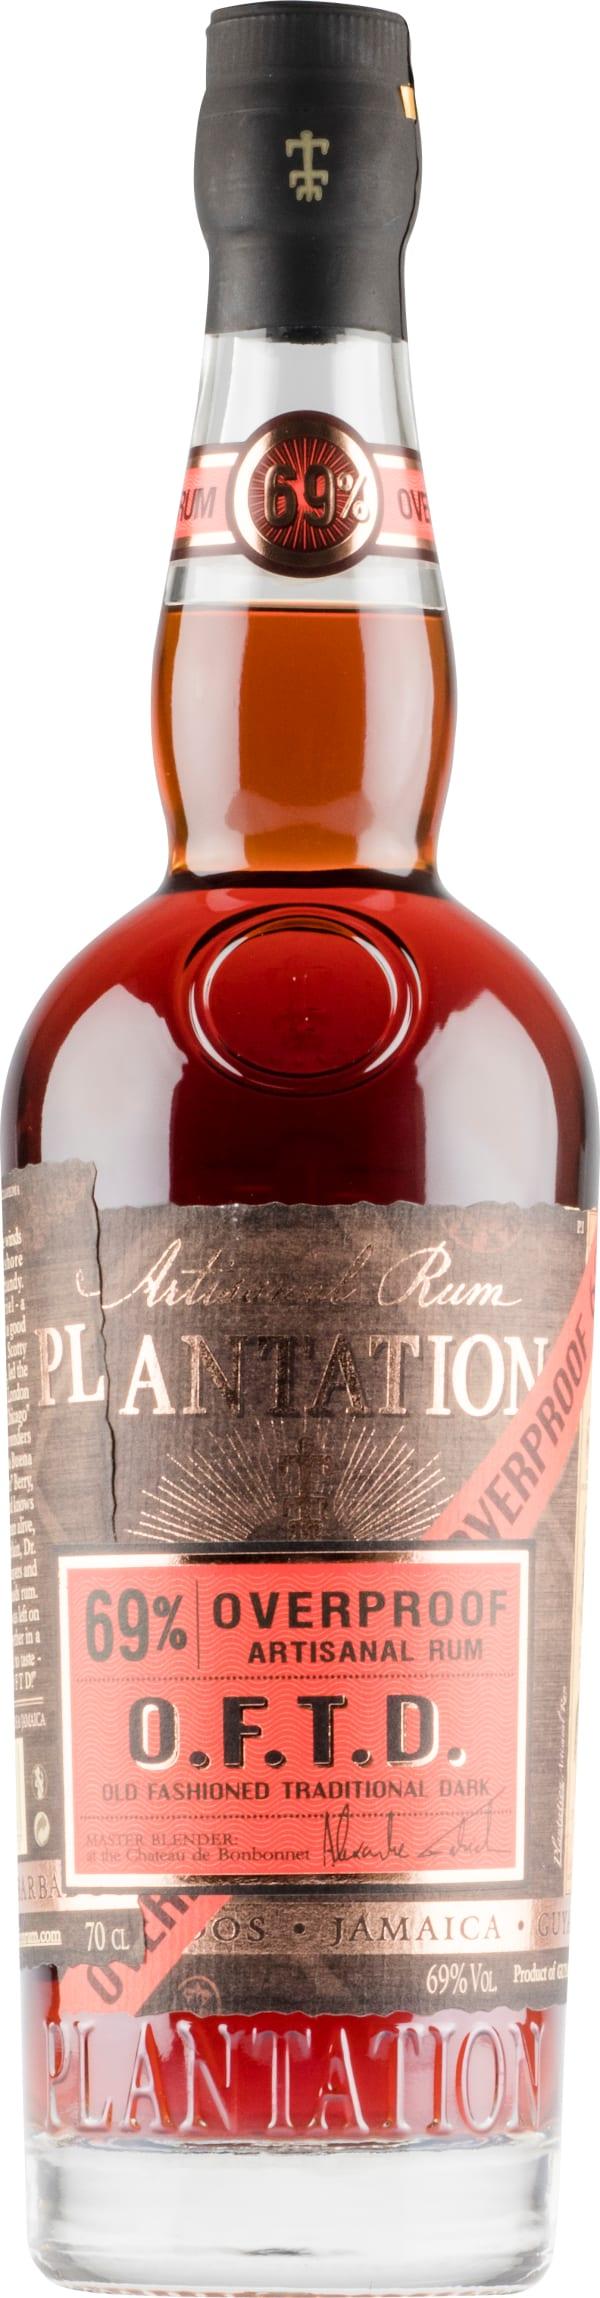 Plantation O.F.T.D